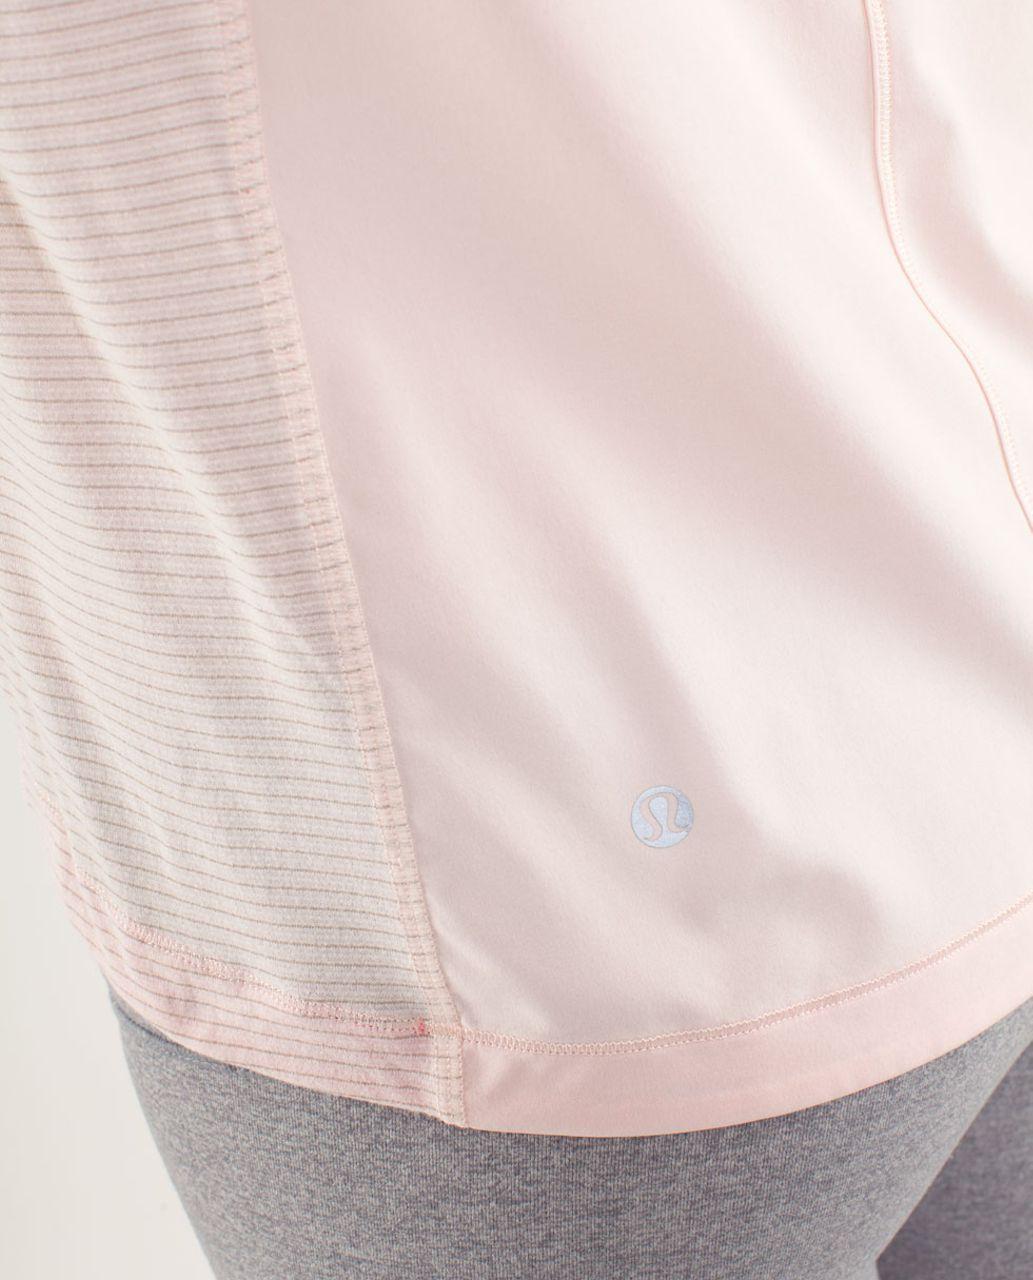 Lululemon Run:  Silver Lining Long Sleeve - Parfait Pink / Pinkelicious